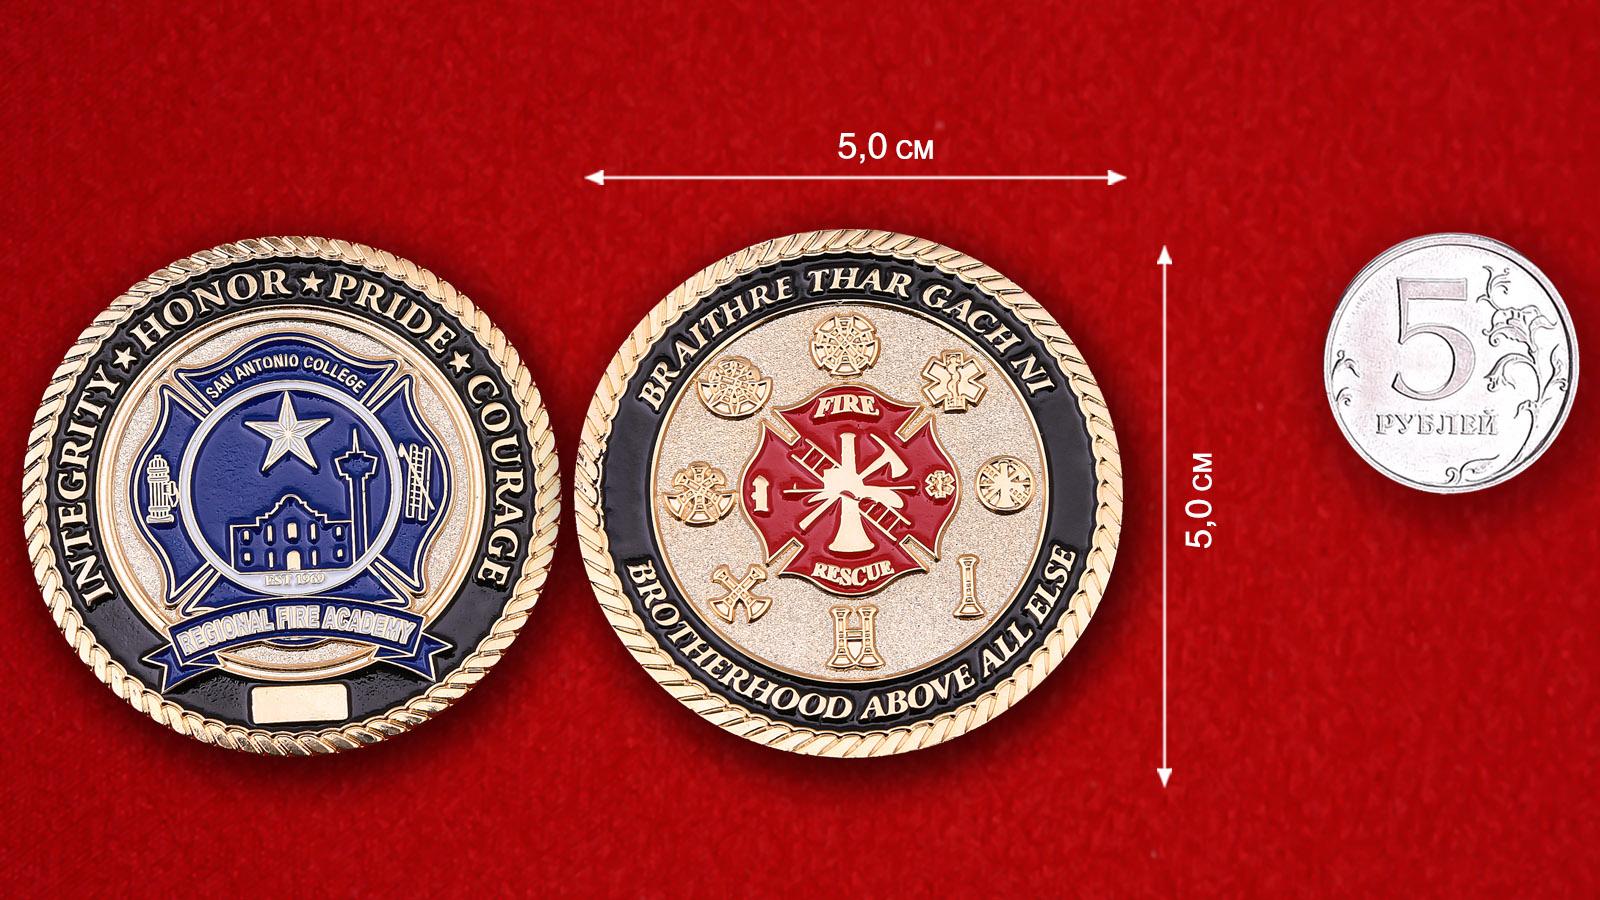 San-Antonio Regional Fire Academy Challenge Coin